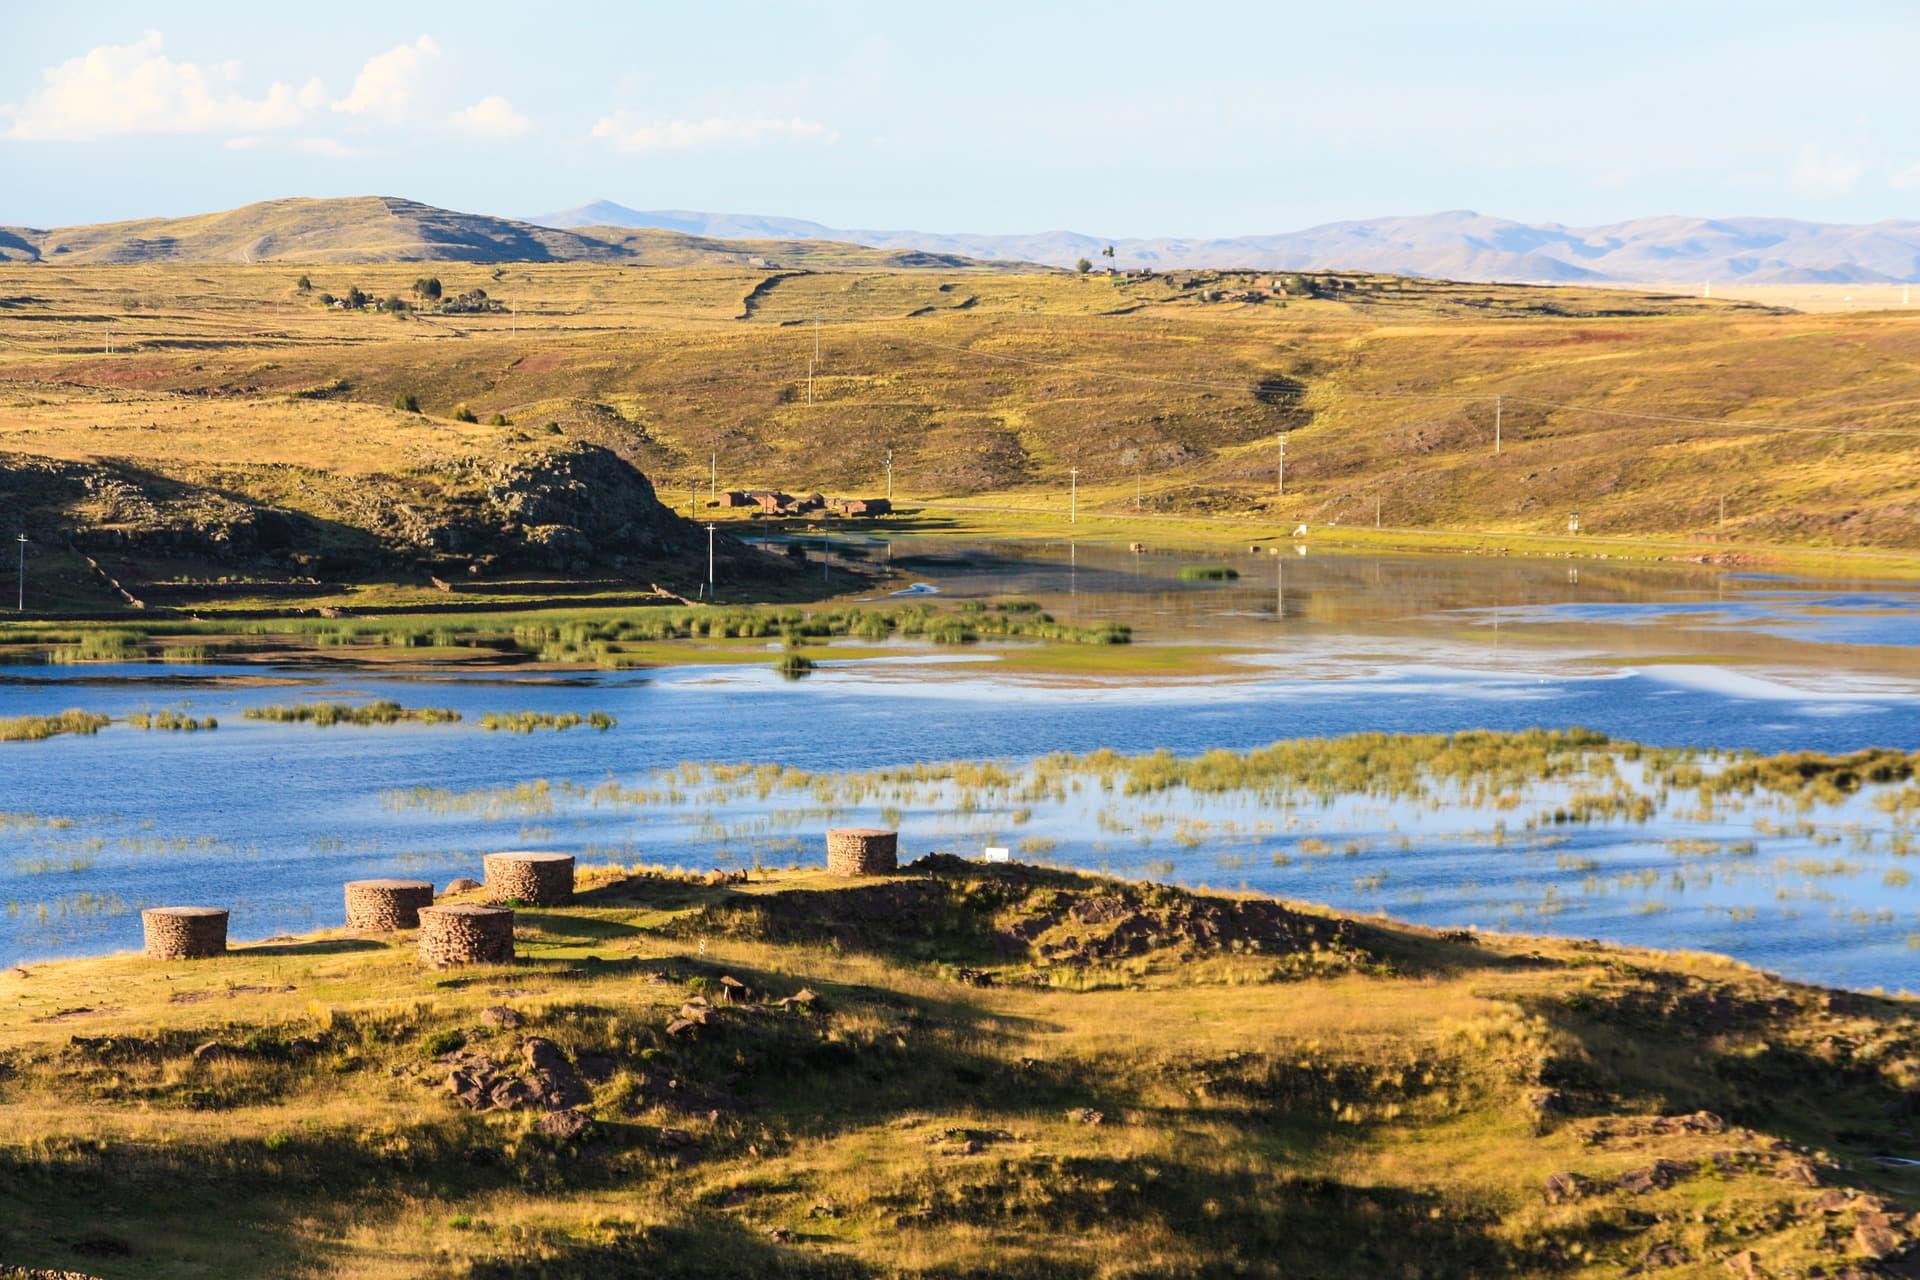 QosqoExpeditions - sillustani tombs towers